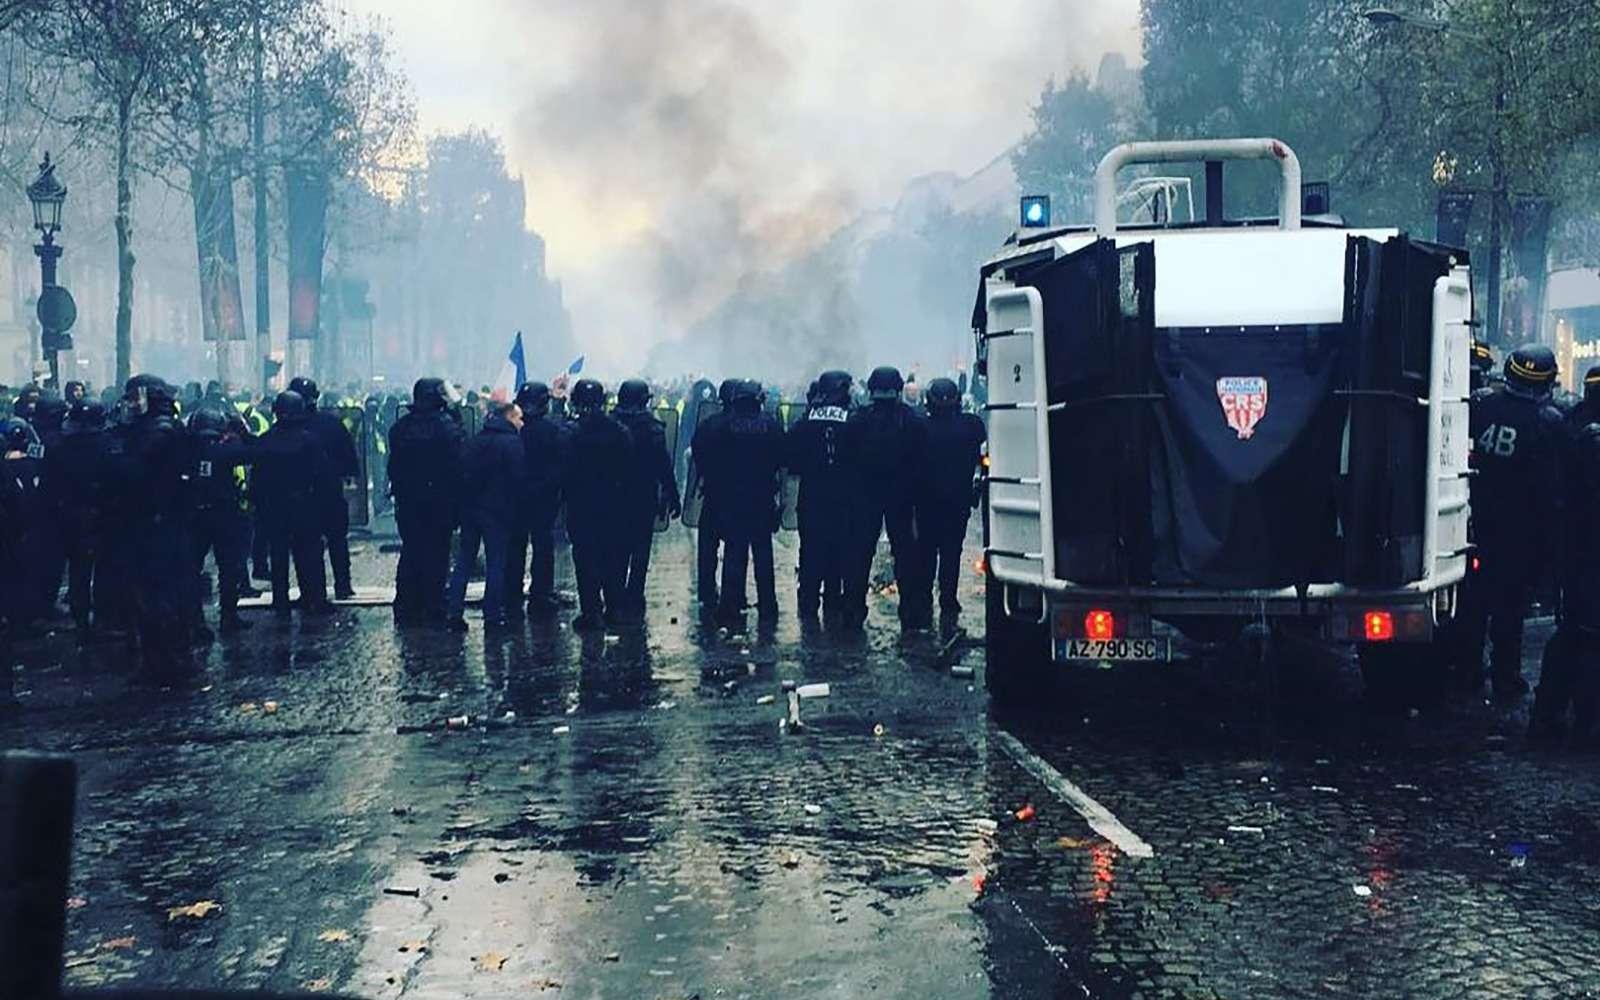 Какфранцузы протестуют против роста цен натопливо: баррикады против водометов— фото 926172